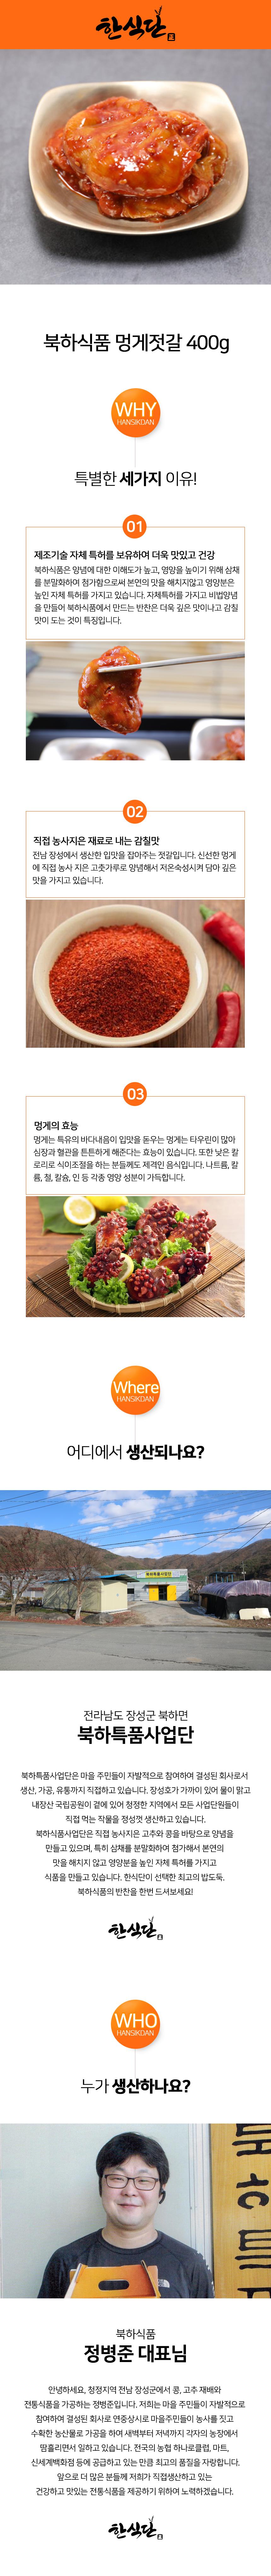 47_page_01_d.jpg